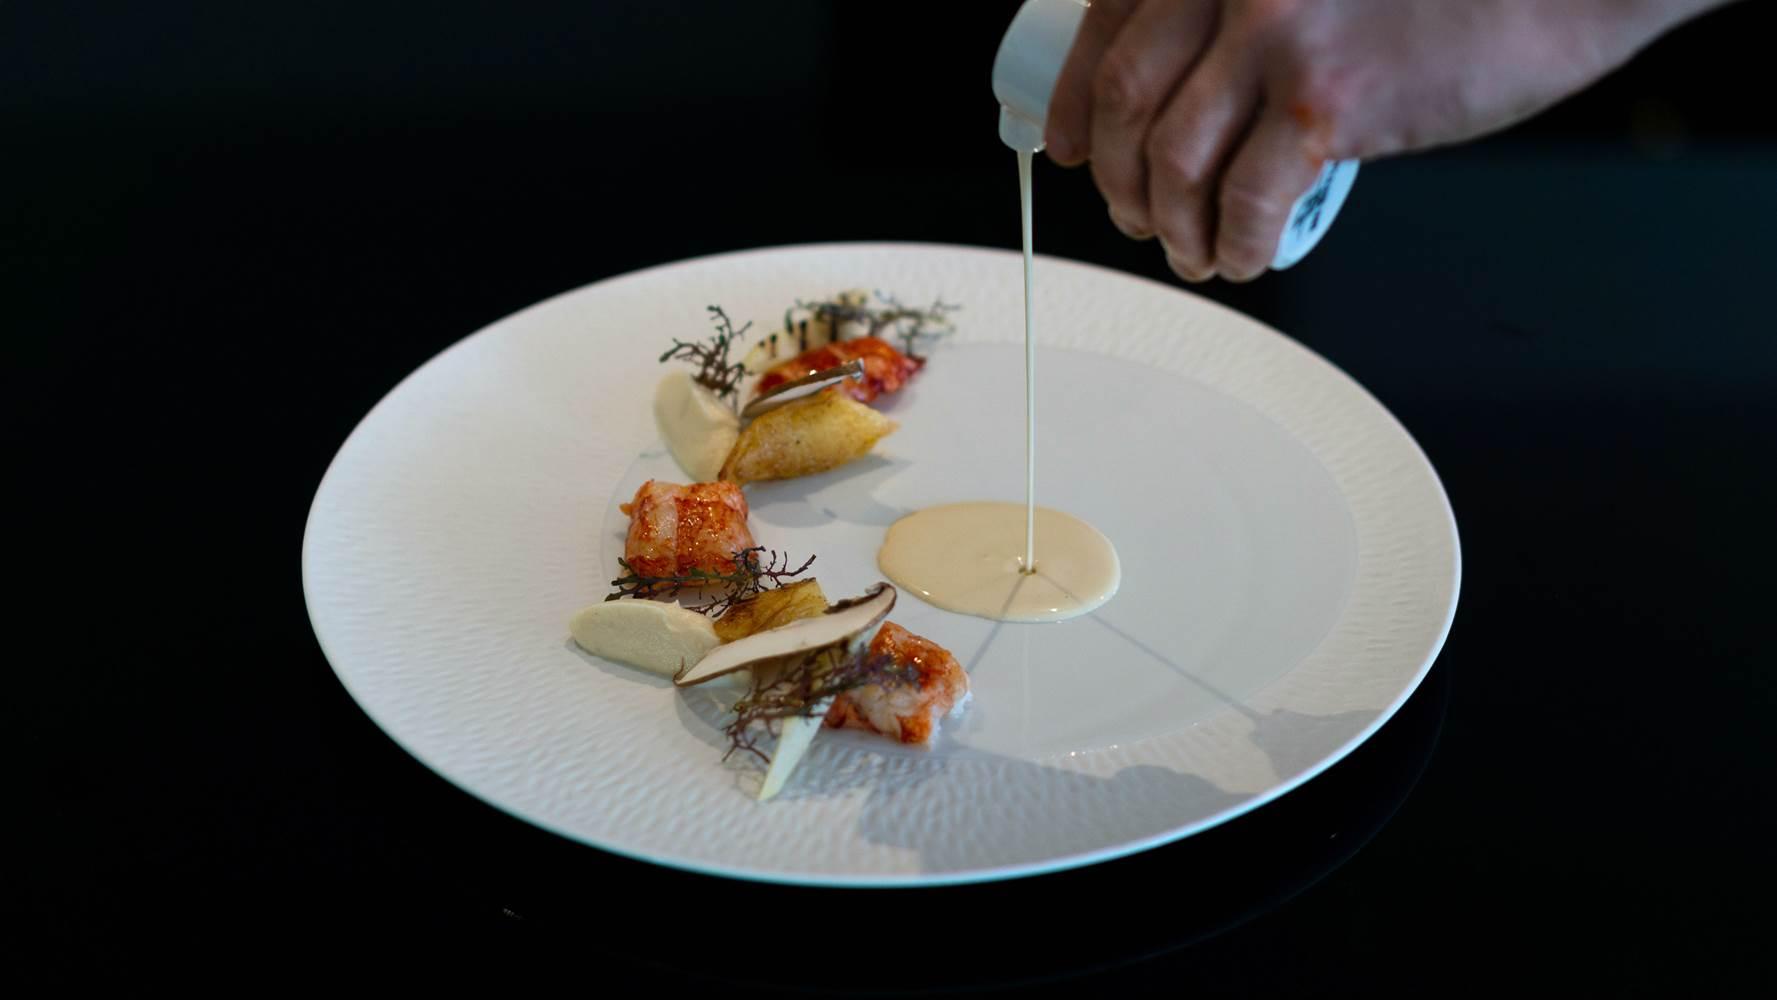 Queue de homard Restaurant L'Eskell Le Diana Hotel et Spa Nuxe Carnac Morbihan Bretagne-Sud ©